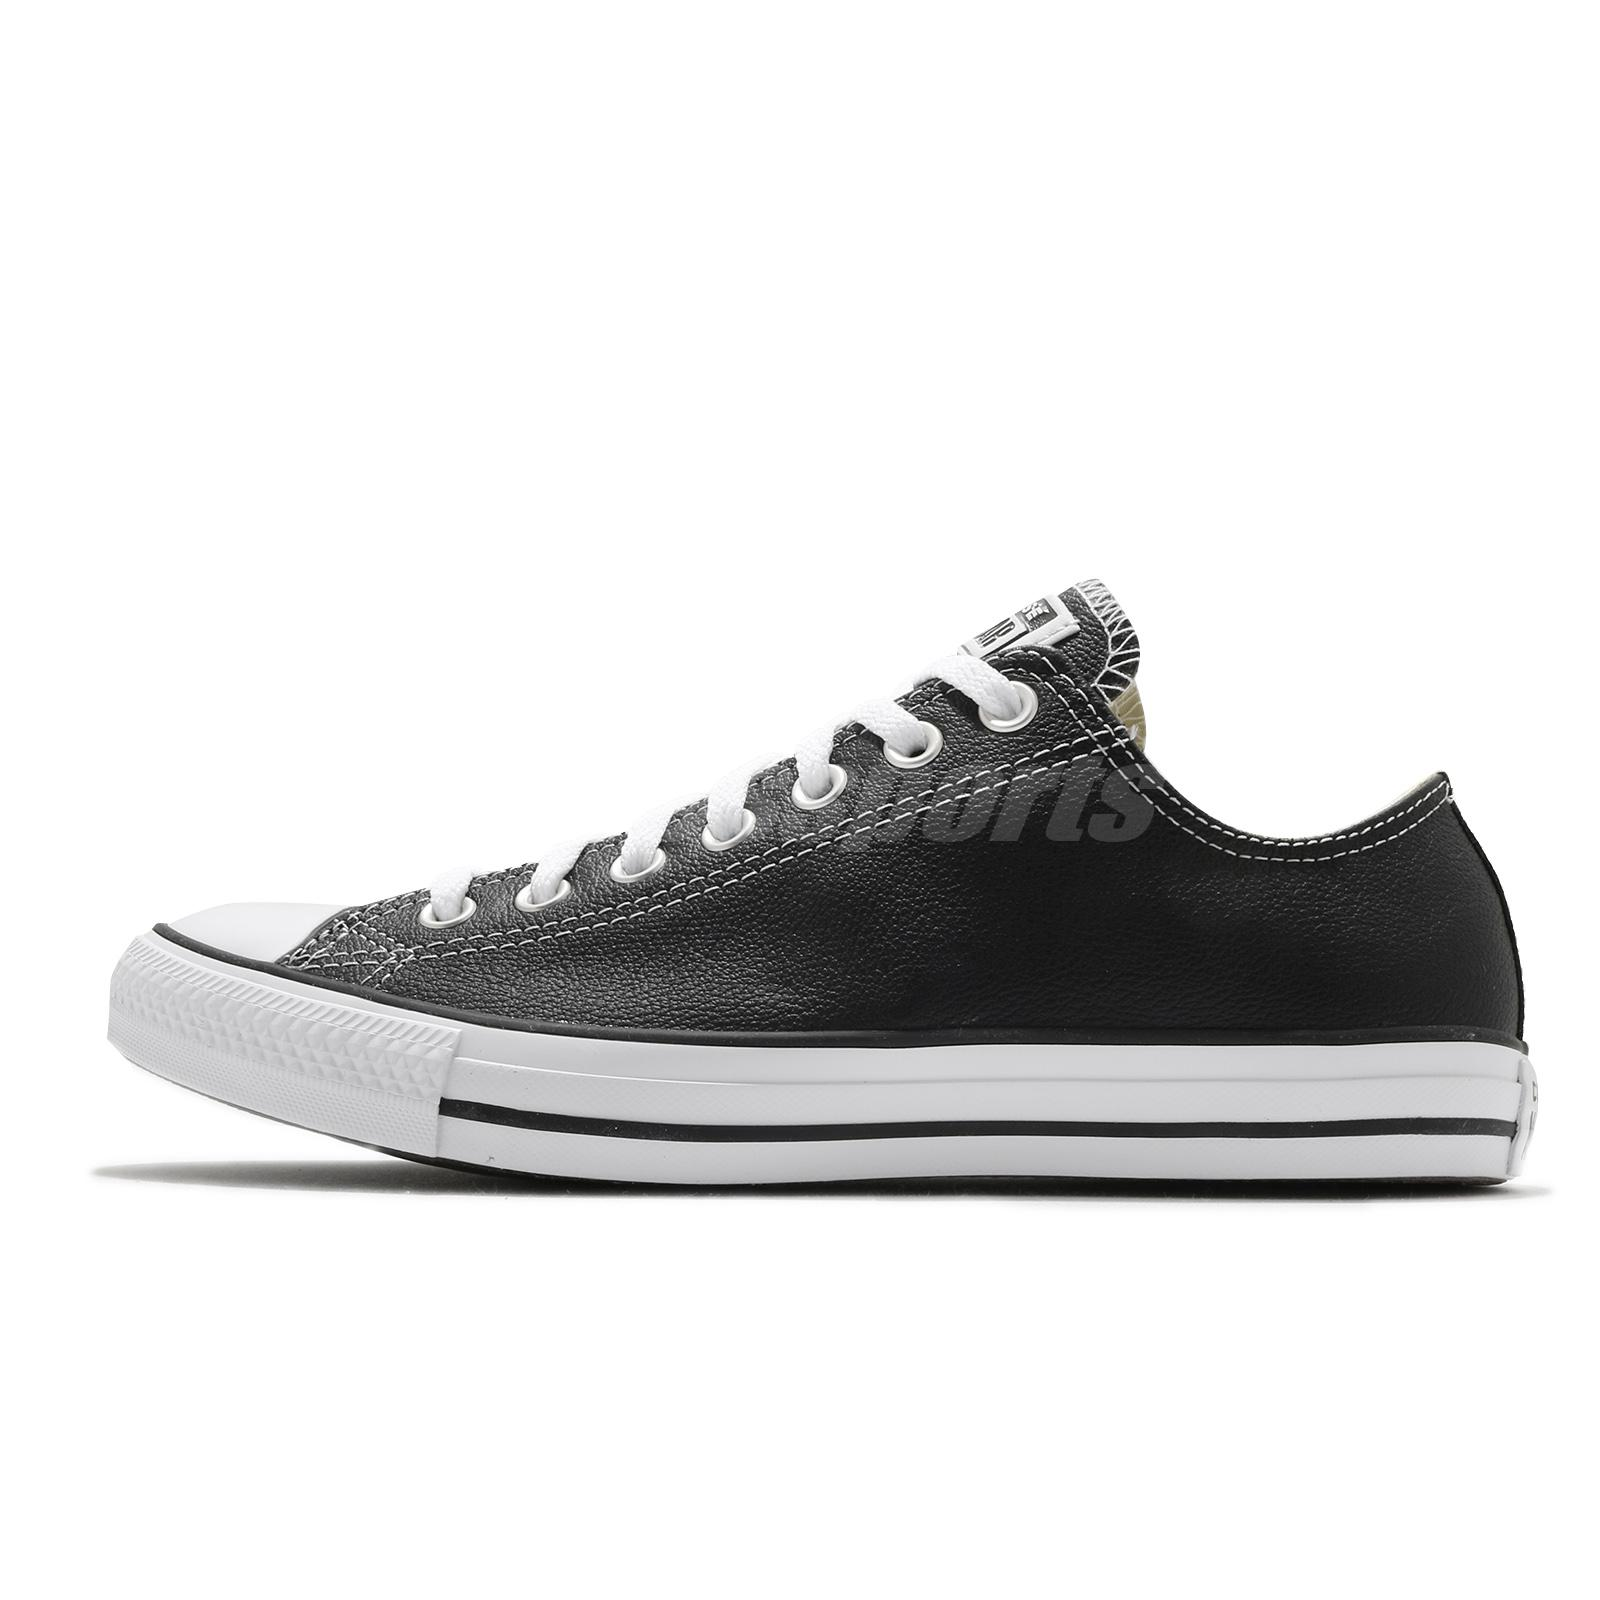 dbcb6dc43400 Converse Chuck Taylor All Star OX Oxford Leather Black Men Women Shoes  132174C